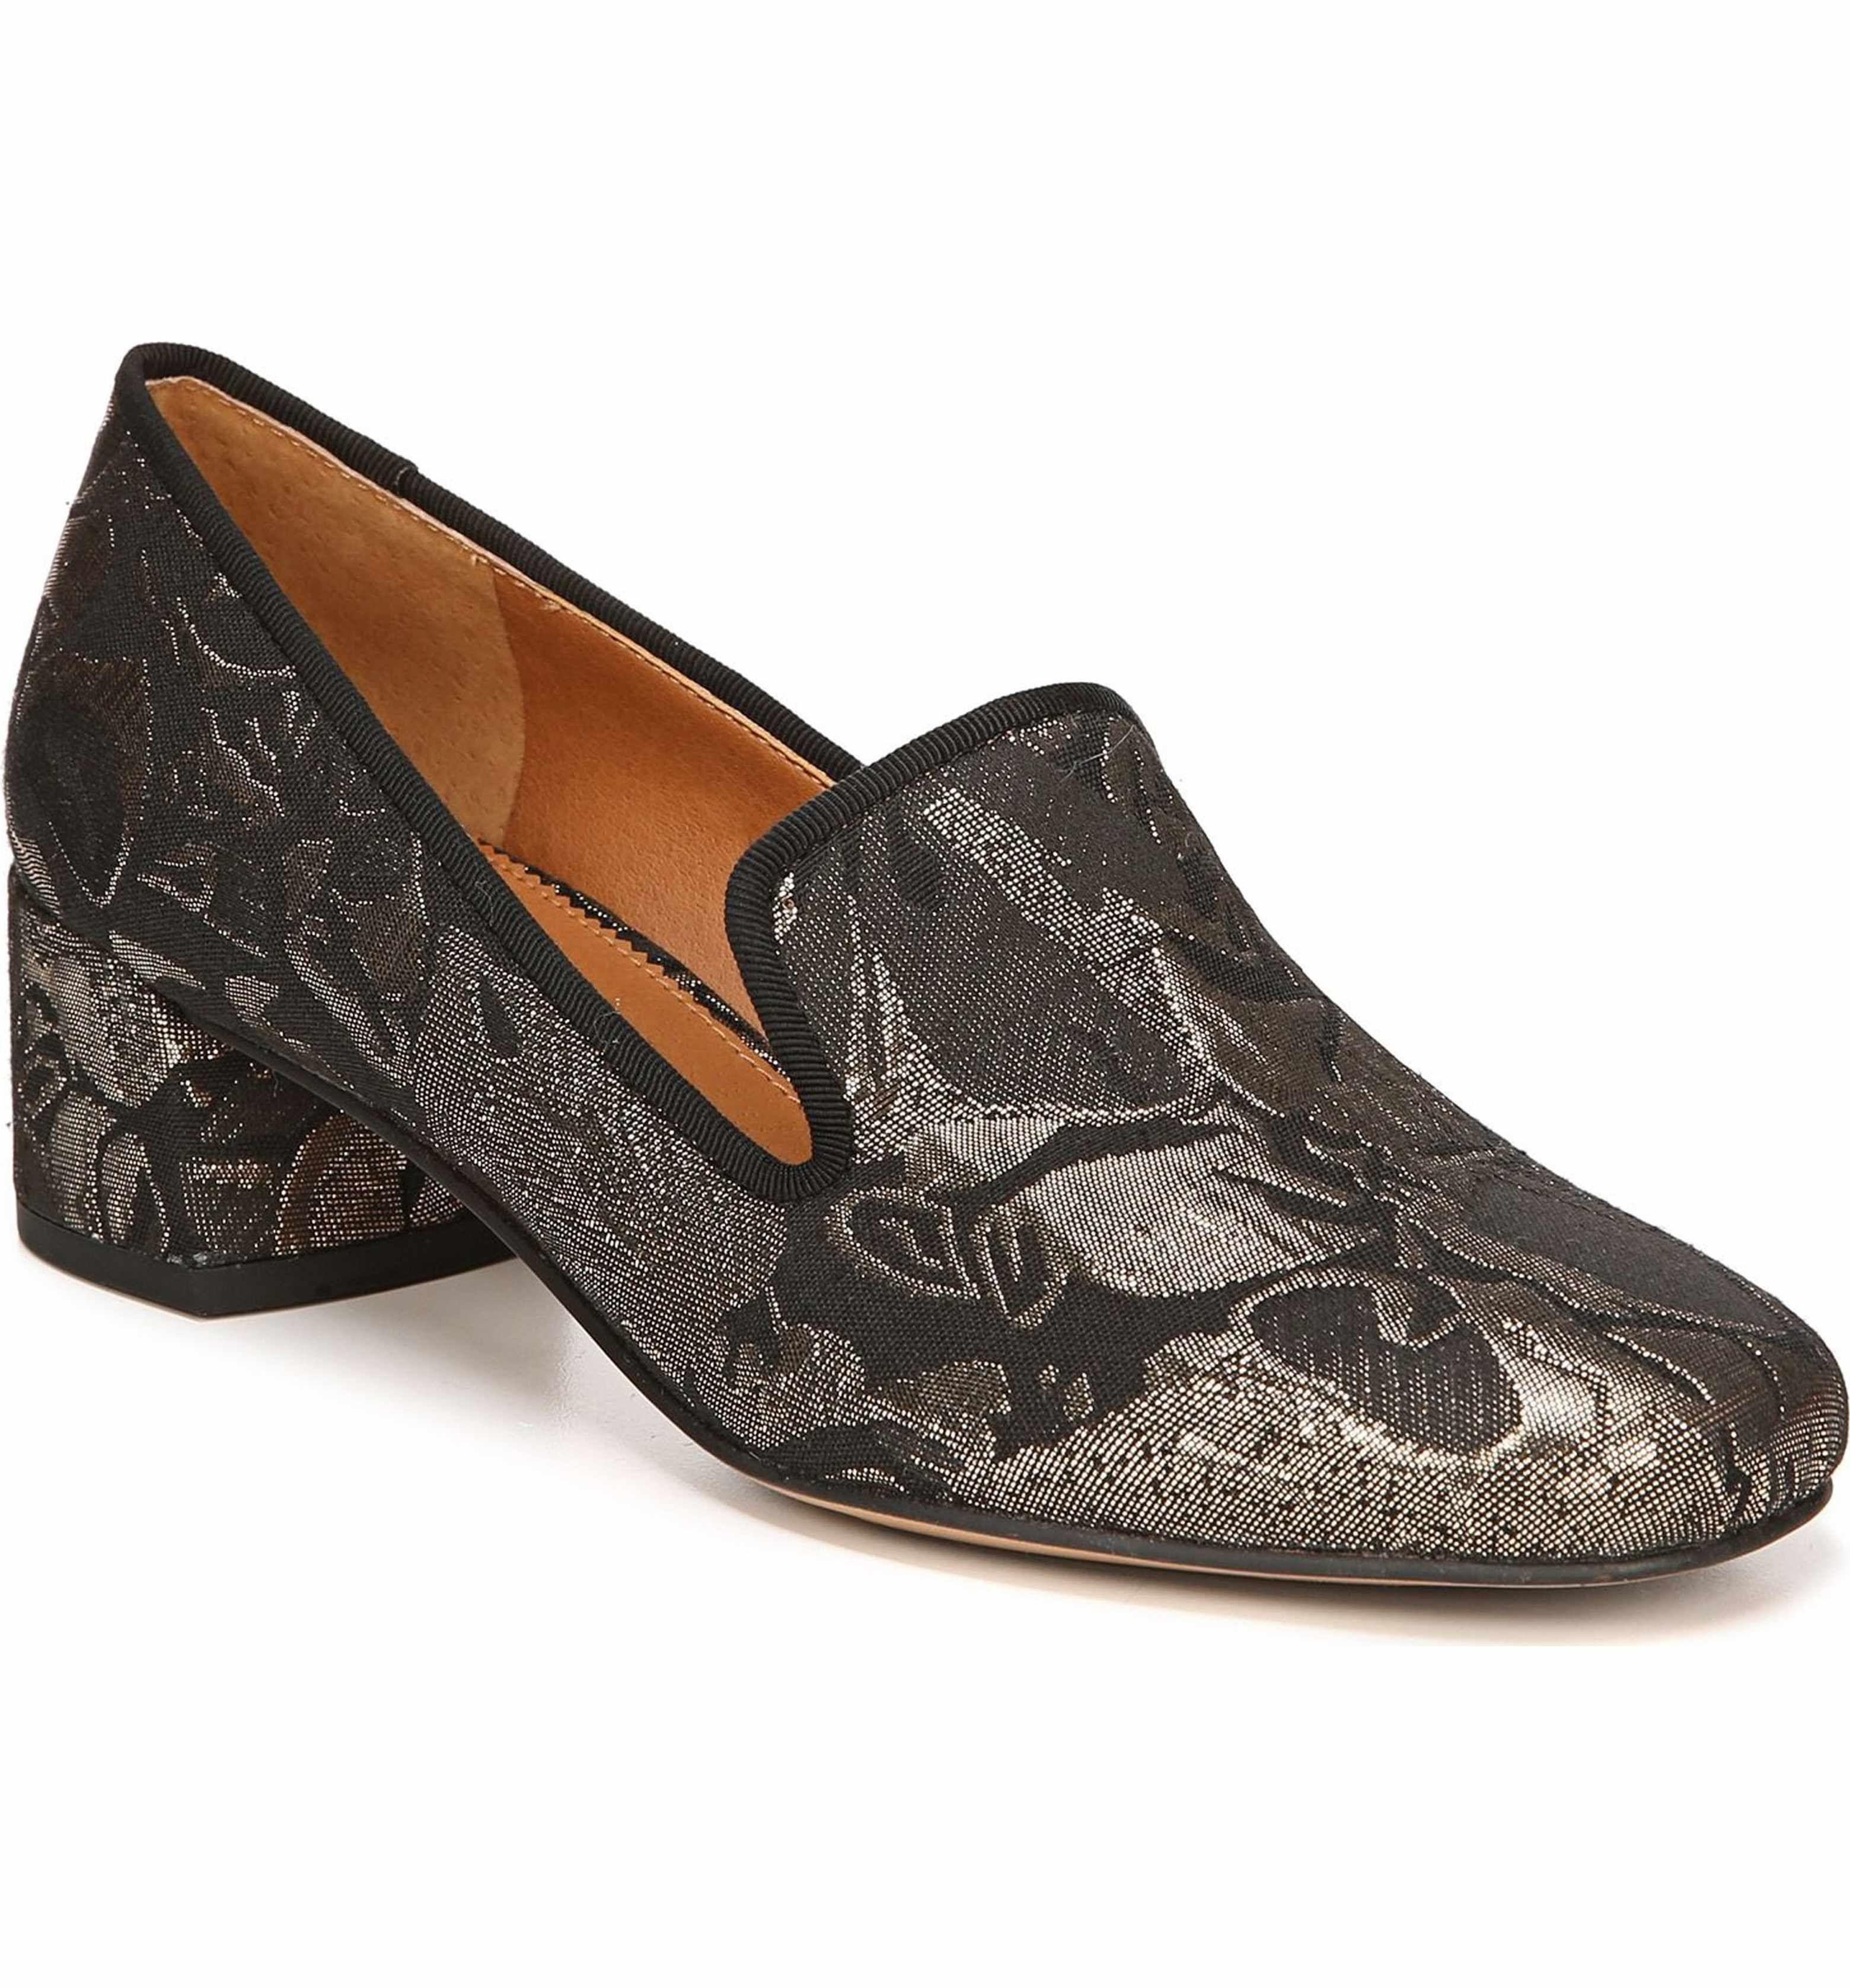 f7db75049448d Main Image - SARTO by Franco Sarto Hettie Pump (Women) | shoes ...